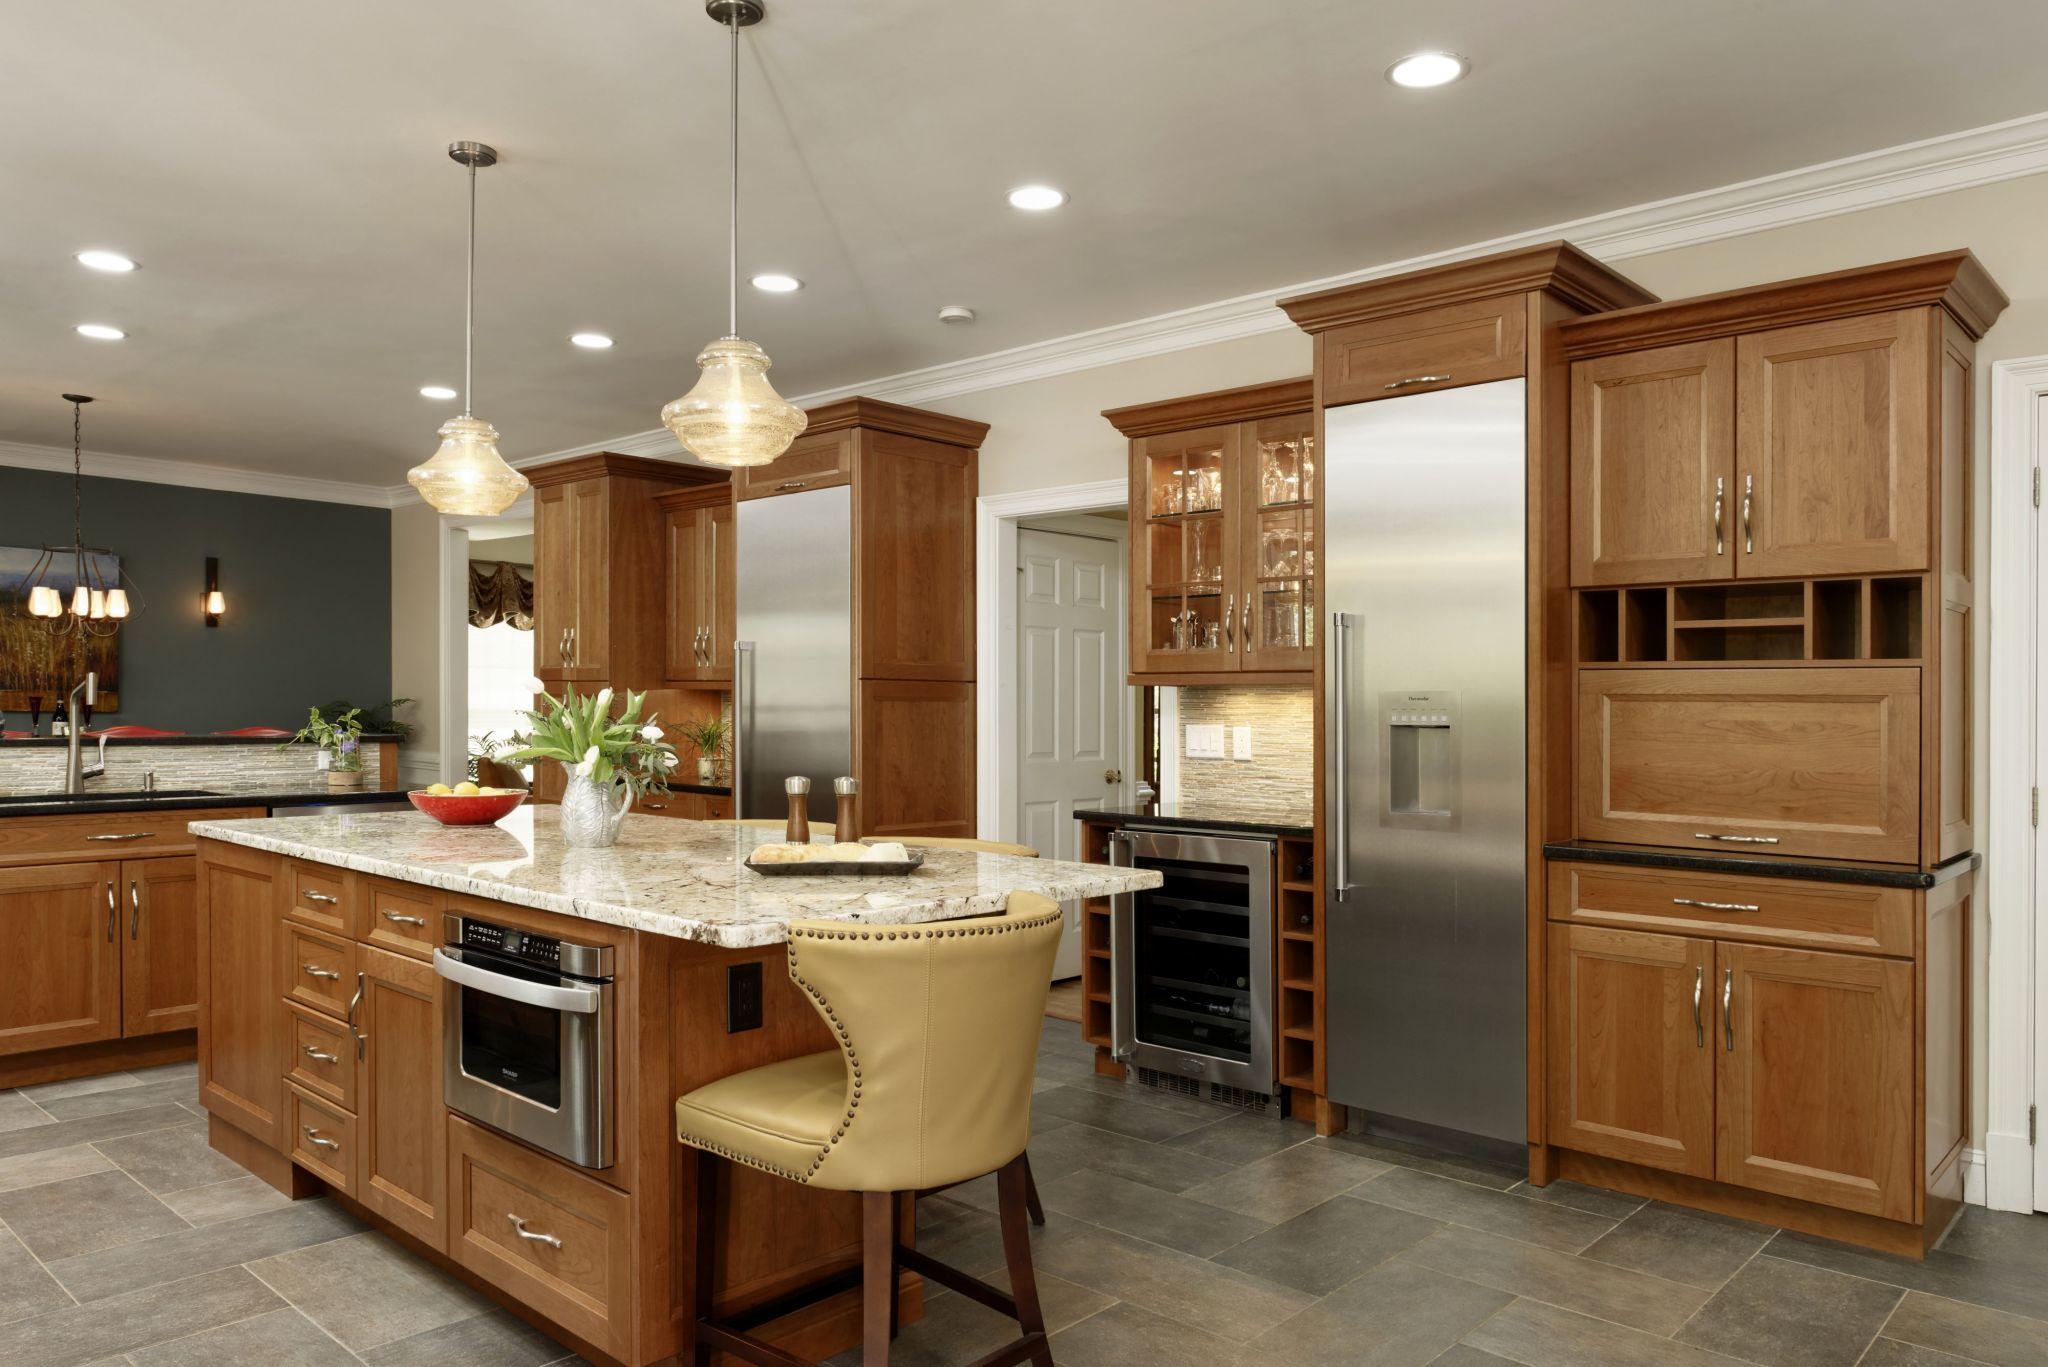 12 factors impacting kitchen remodel costs